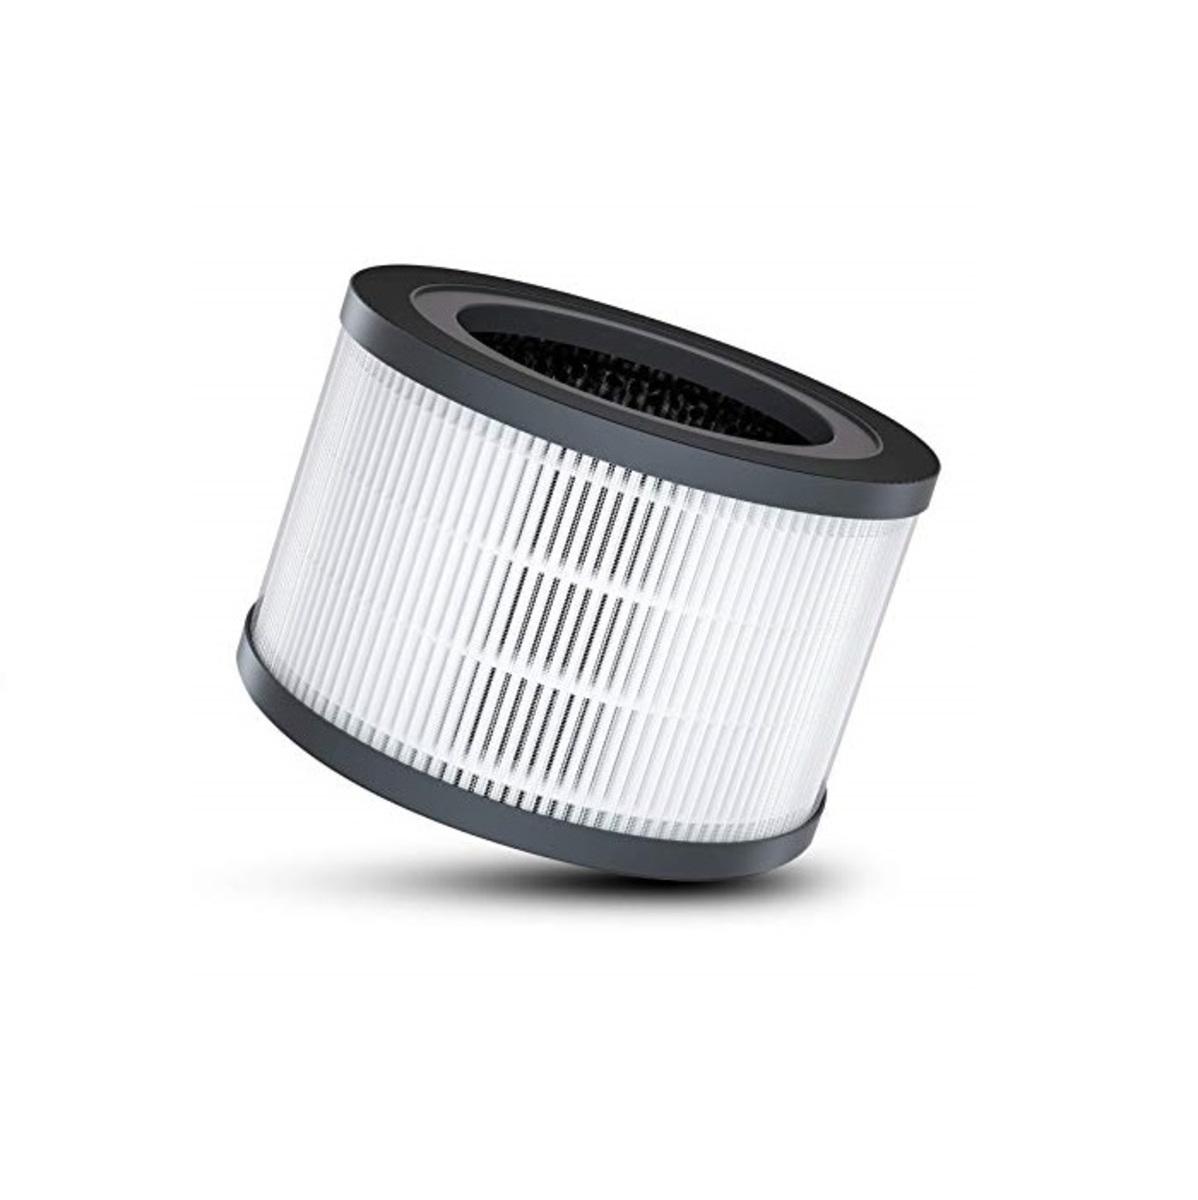 Filter for CF-8010 HEPA Filter